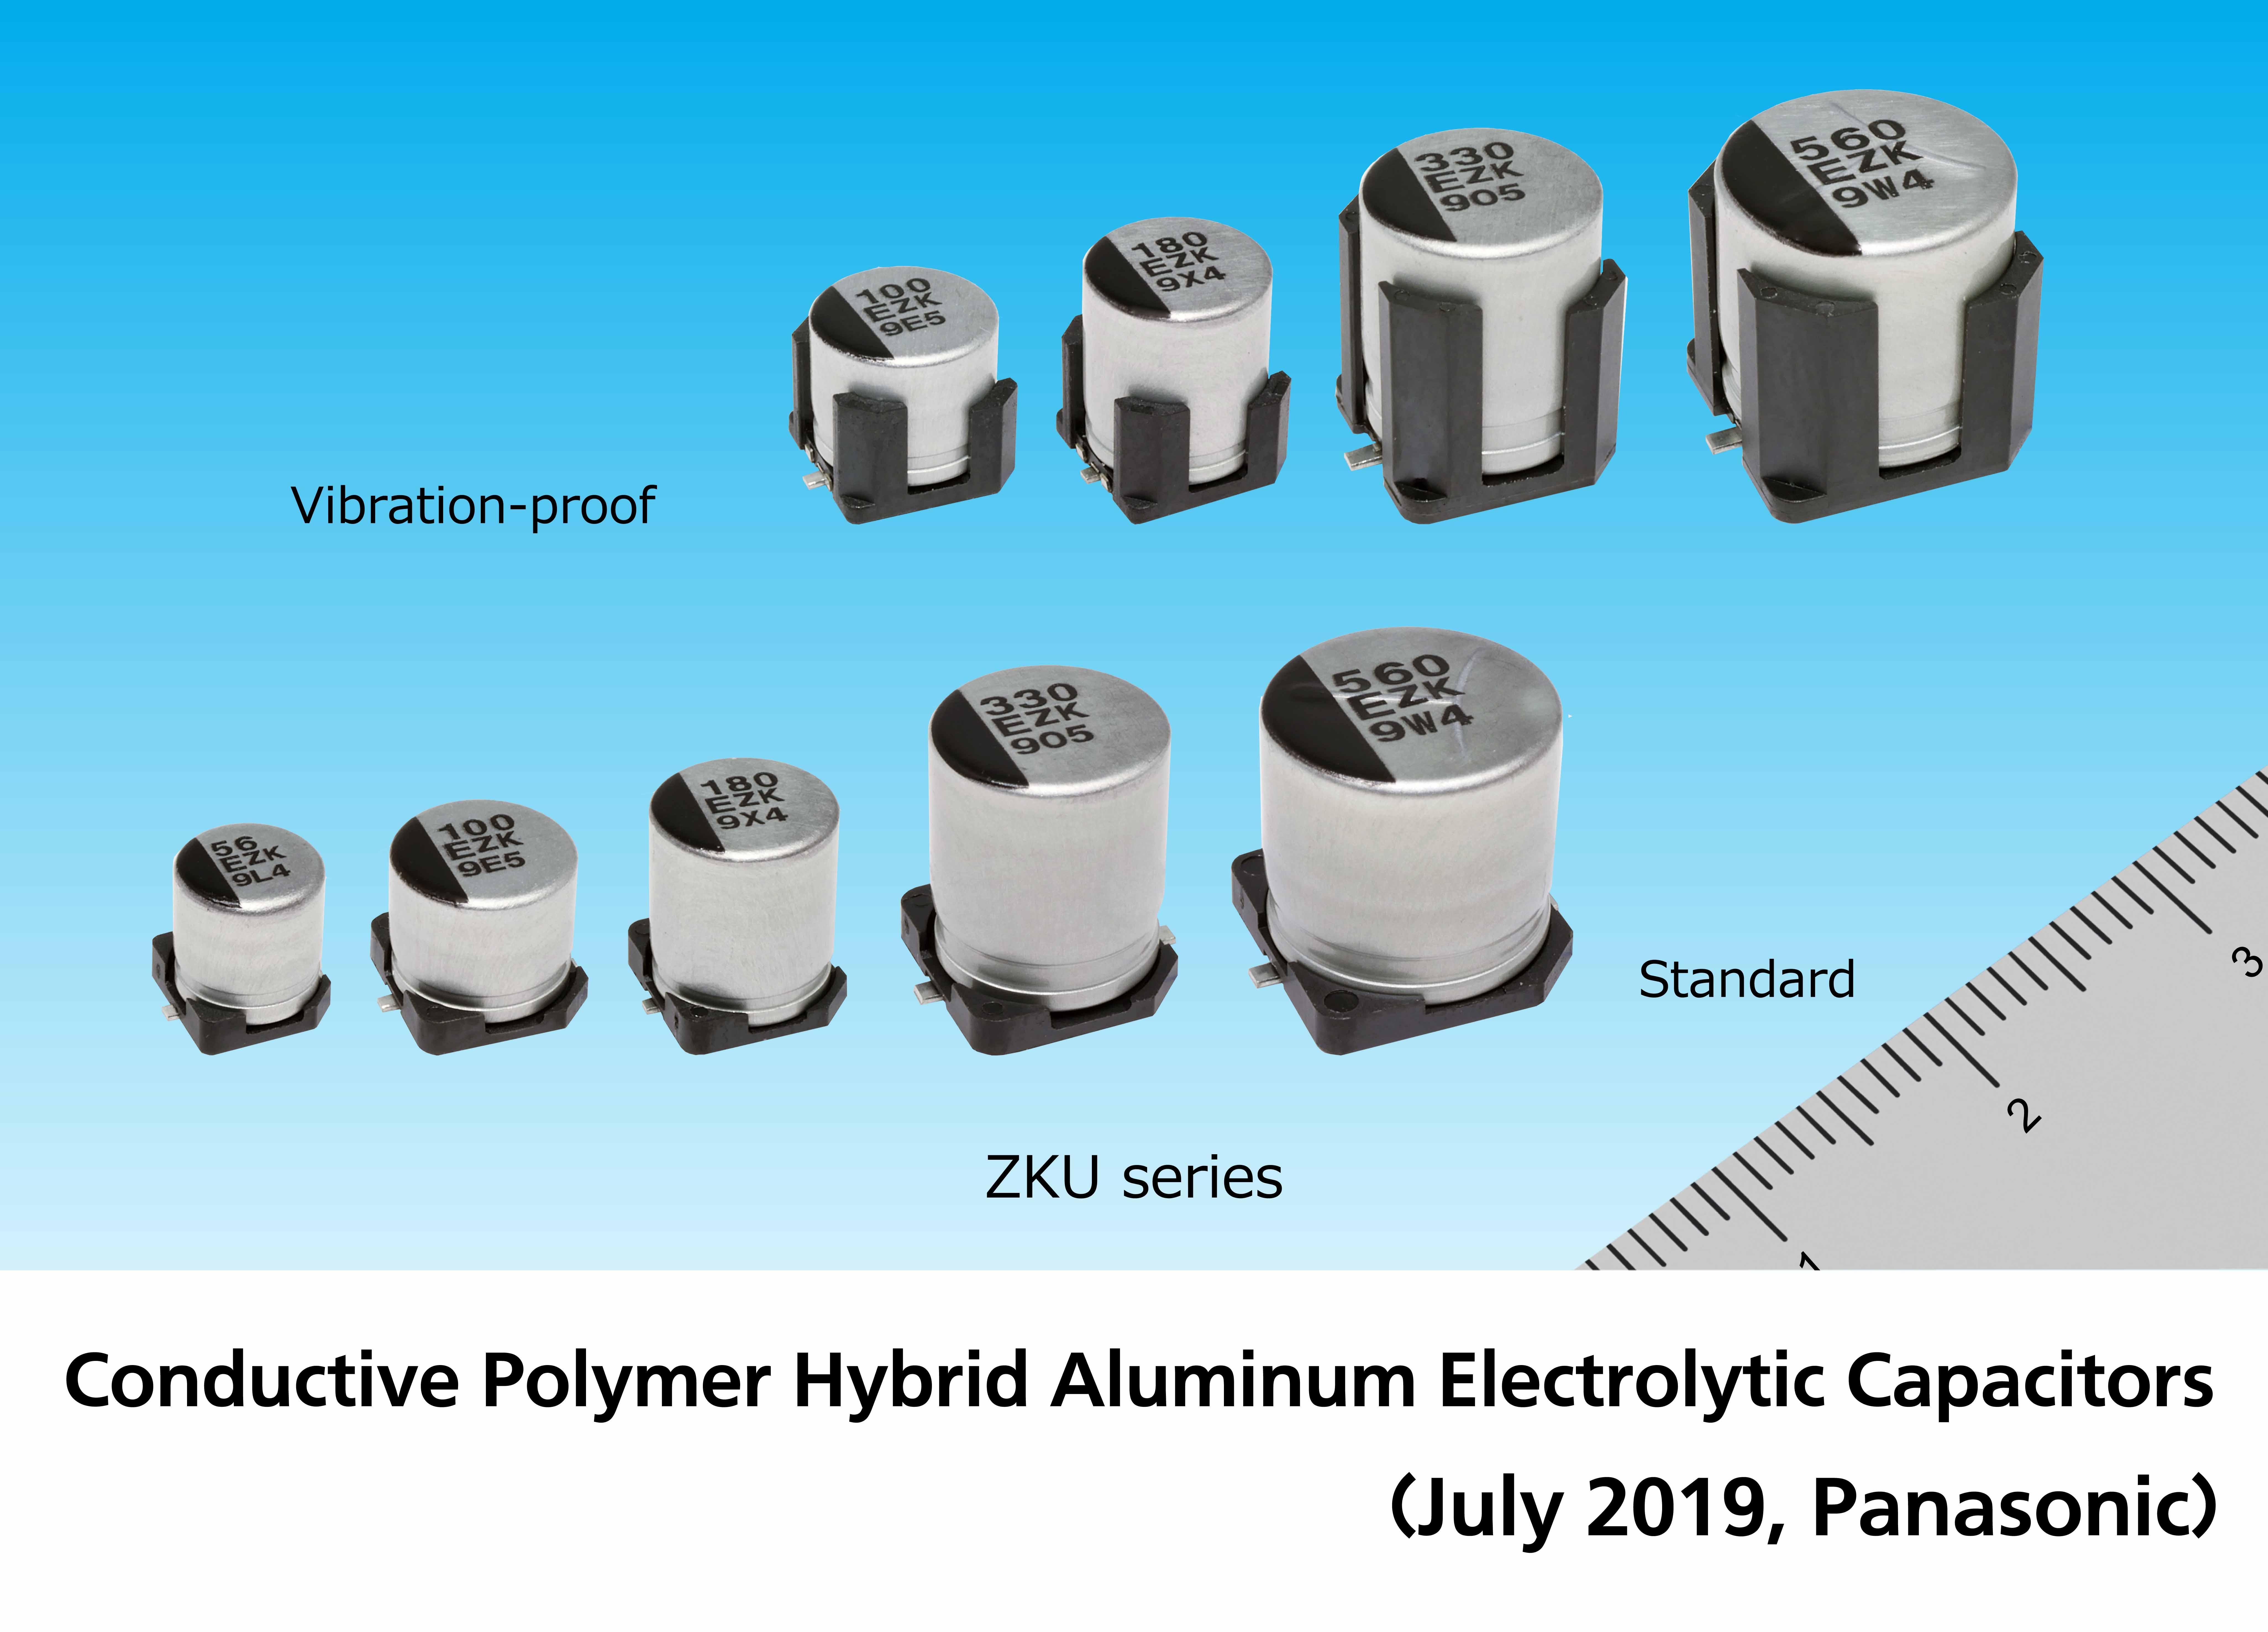 image: Conductive Polymer Hybrid Aluminum Electrolytic Capacitors (ZKU Series)